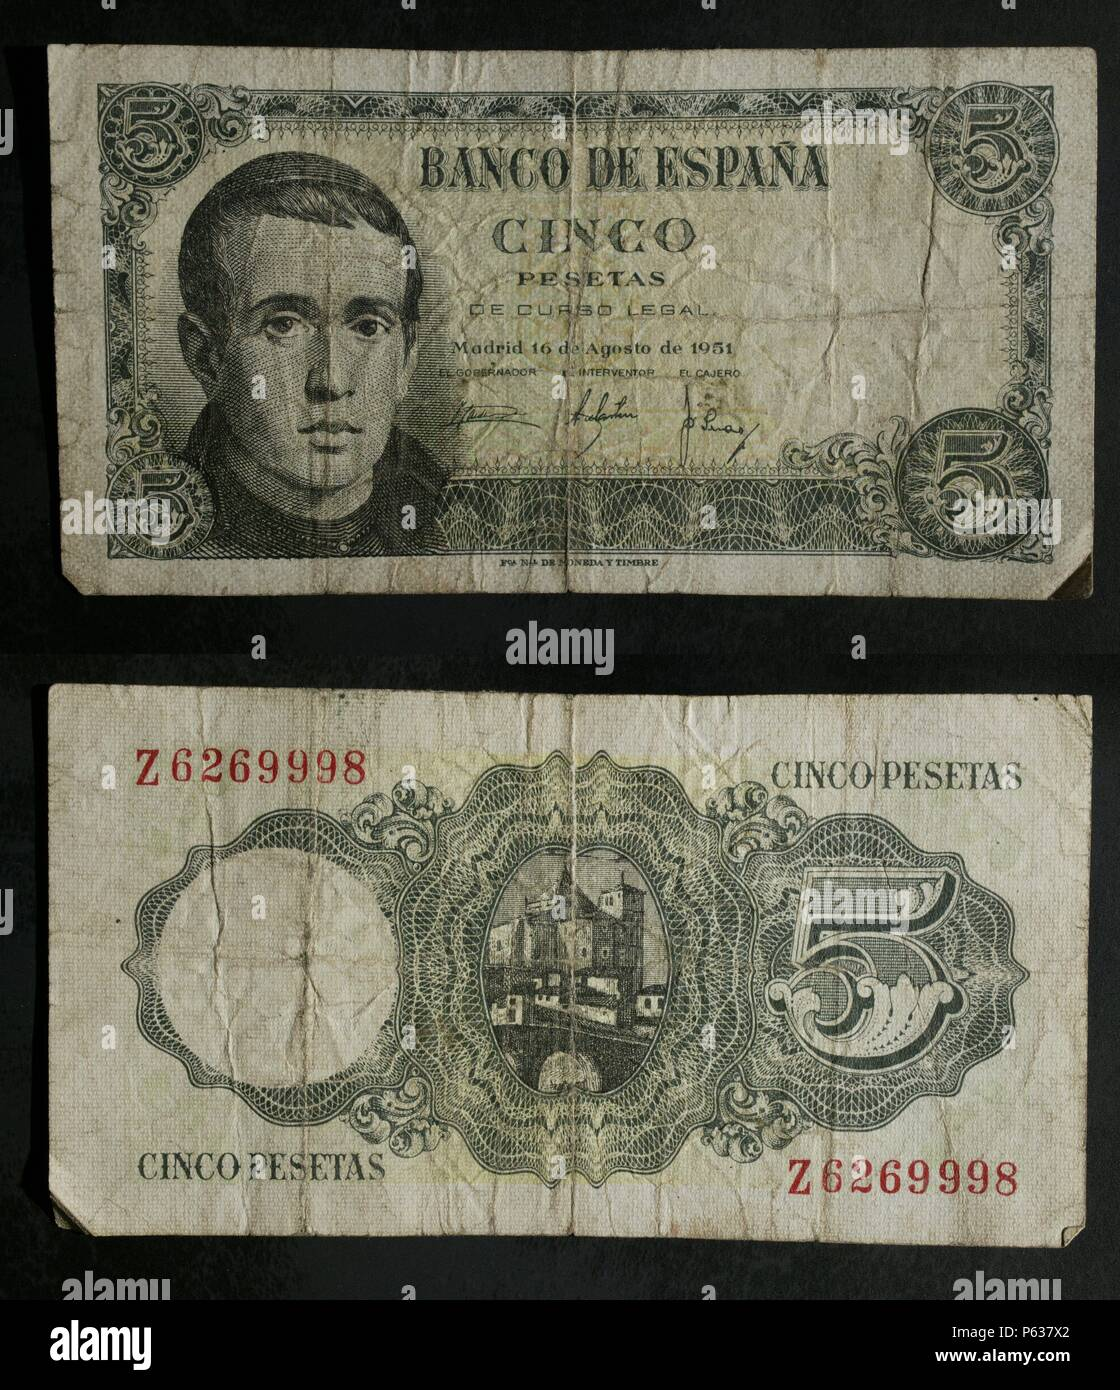 DINERO: BILLETE DE CINCO PESETAS DE 1951. ANVERSO: RETRATO DE JAIME BALMES. - Stock Image